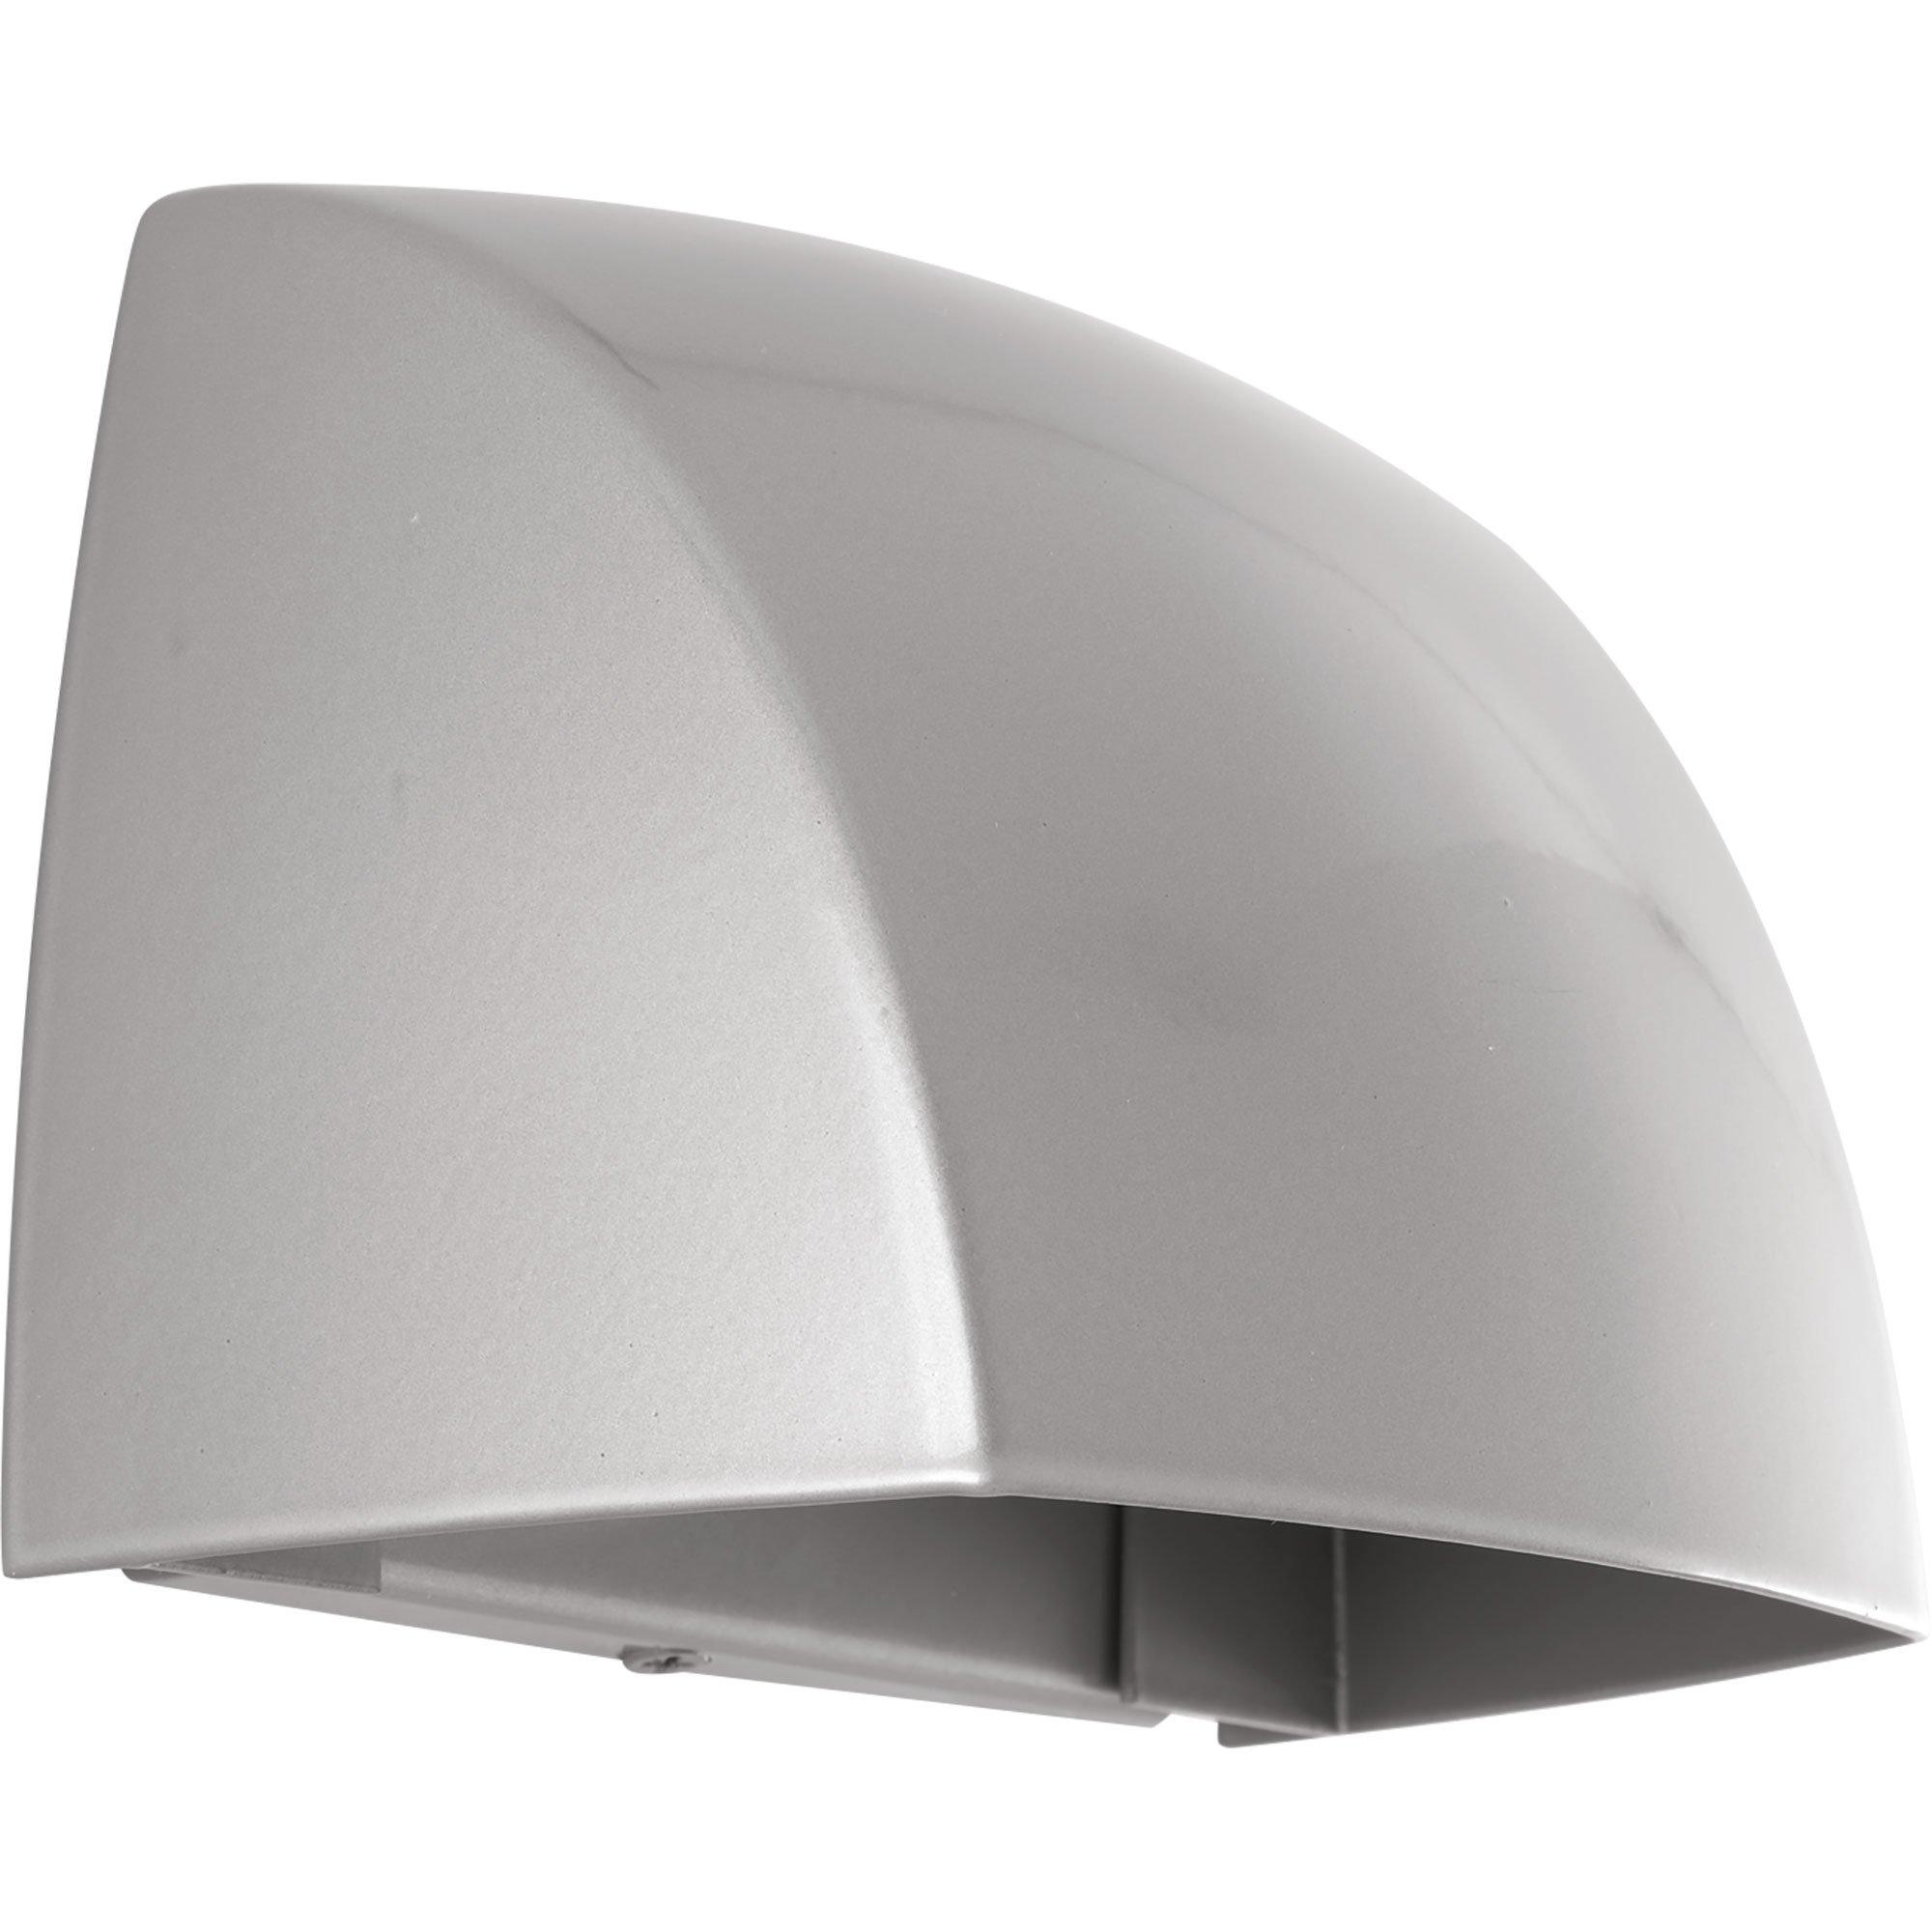 Progress Lighting P5634-8230K9 Cornice One-Light Wall Sconce with HAL AC LED Module, Metallic Gray